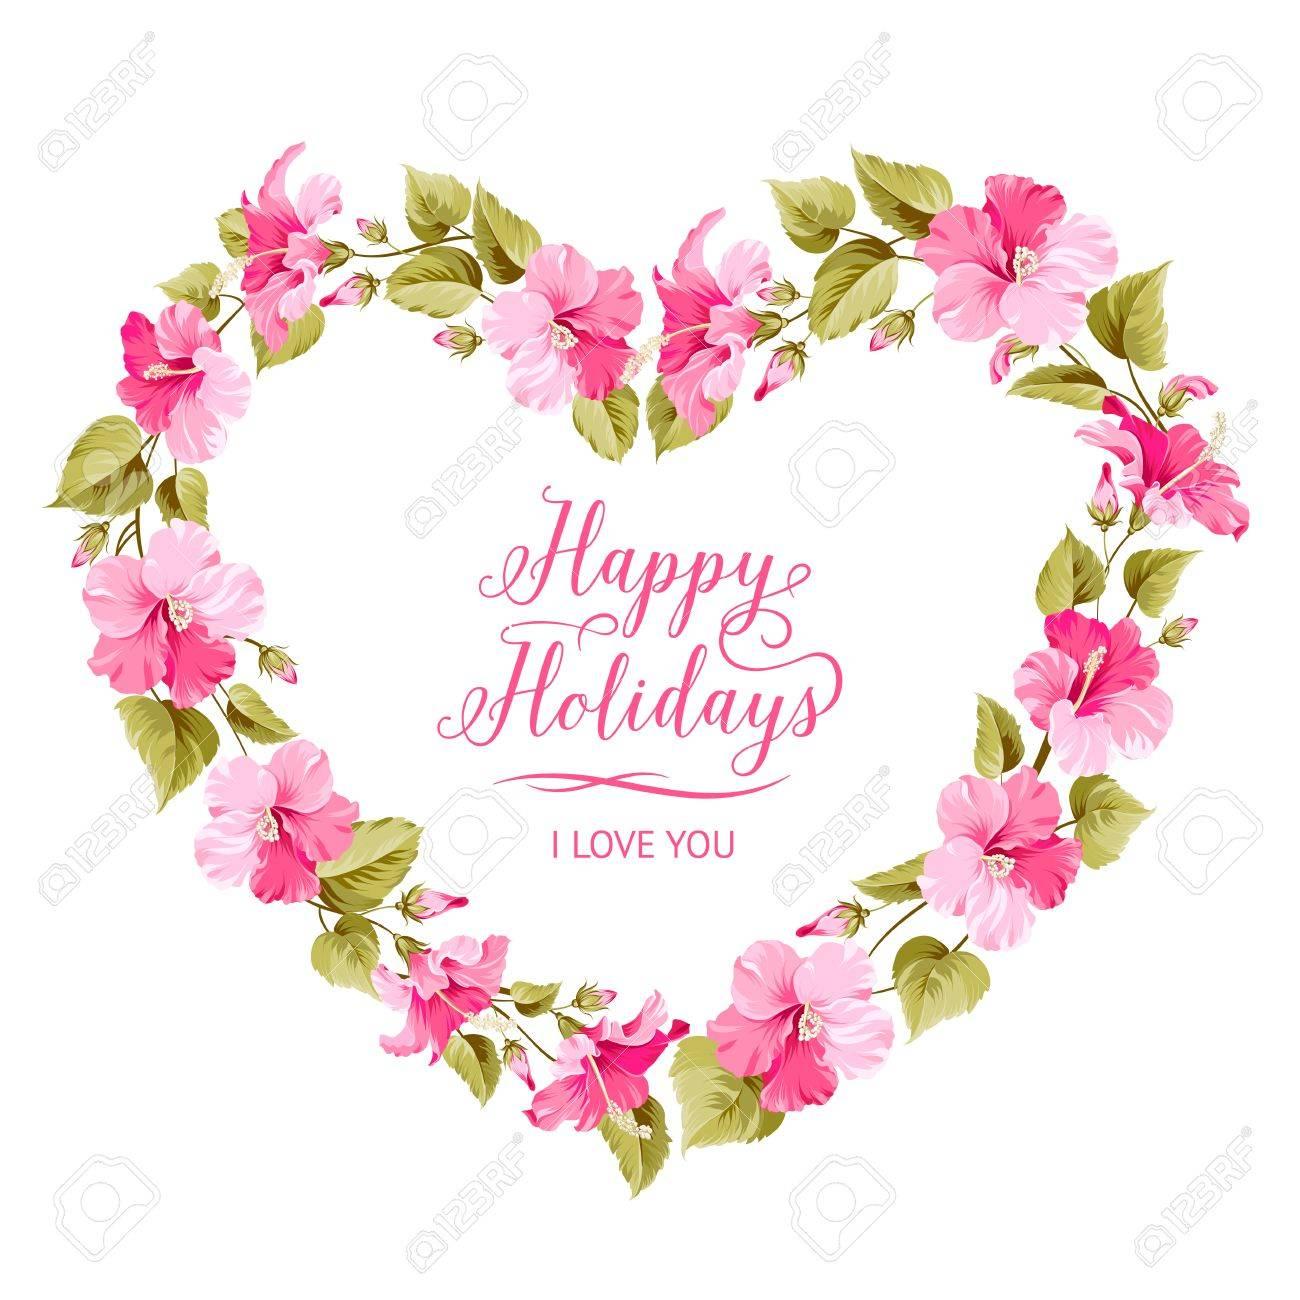 Wedding invitation card with happy holyday text and romantic vector wedding invitation card with happy holyday text and romantic flowers vector illustration stopboris Gallery